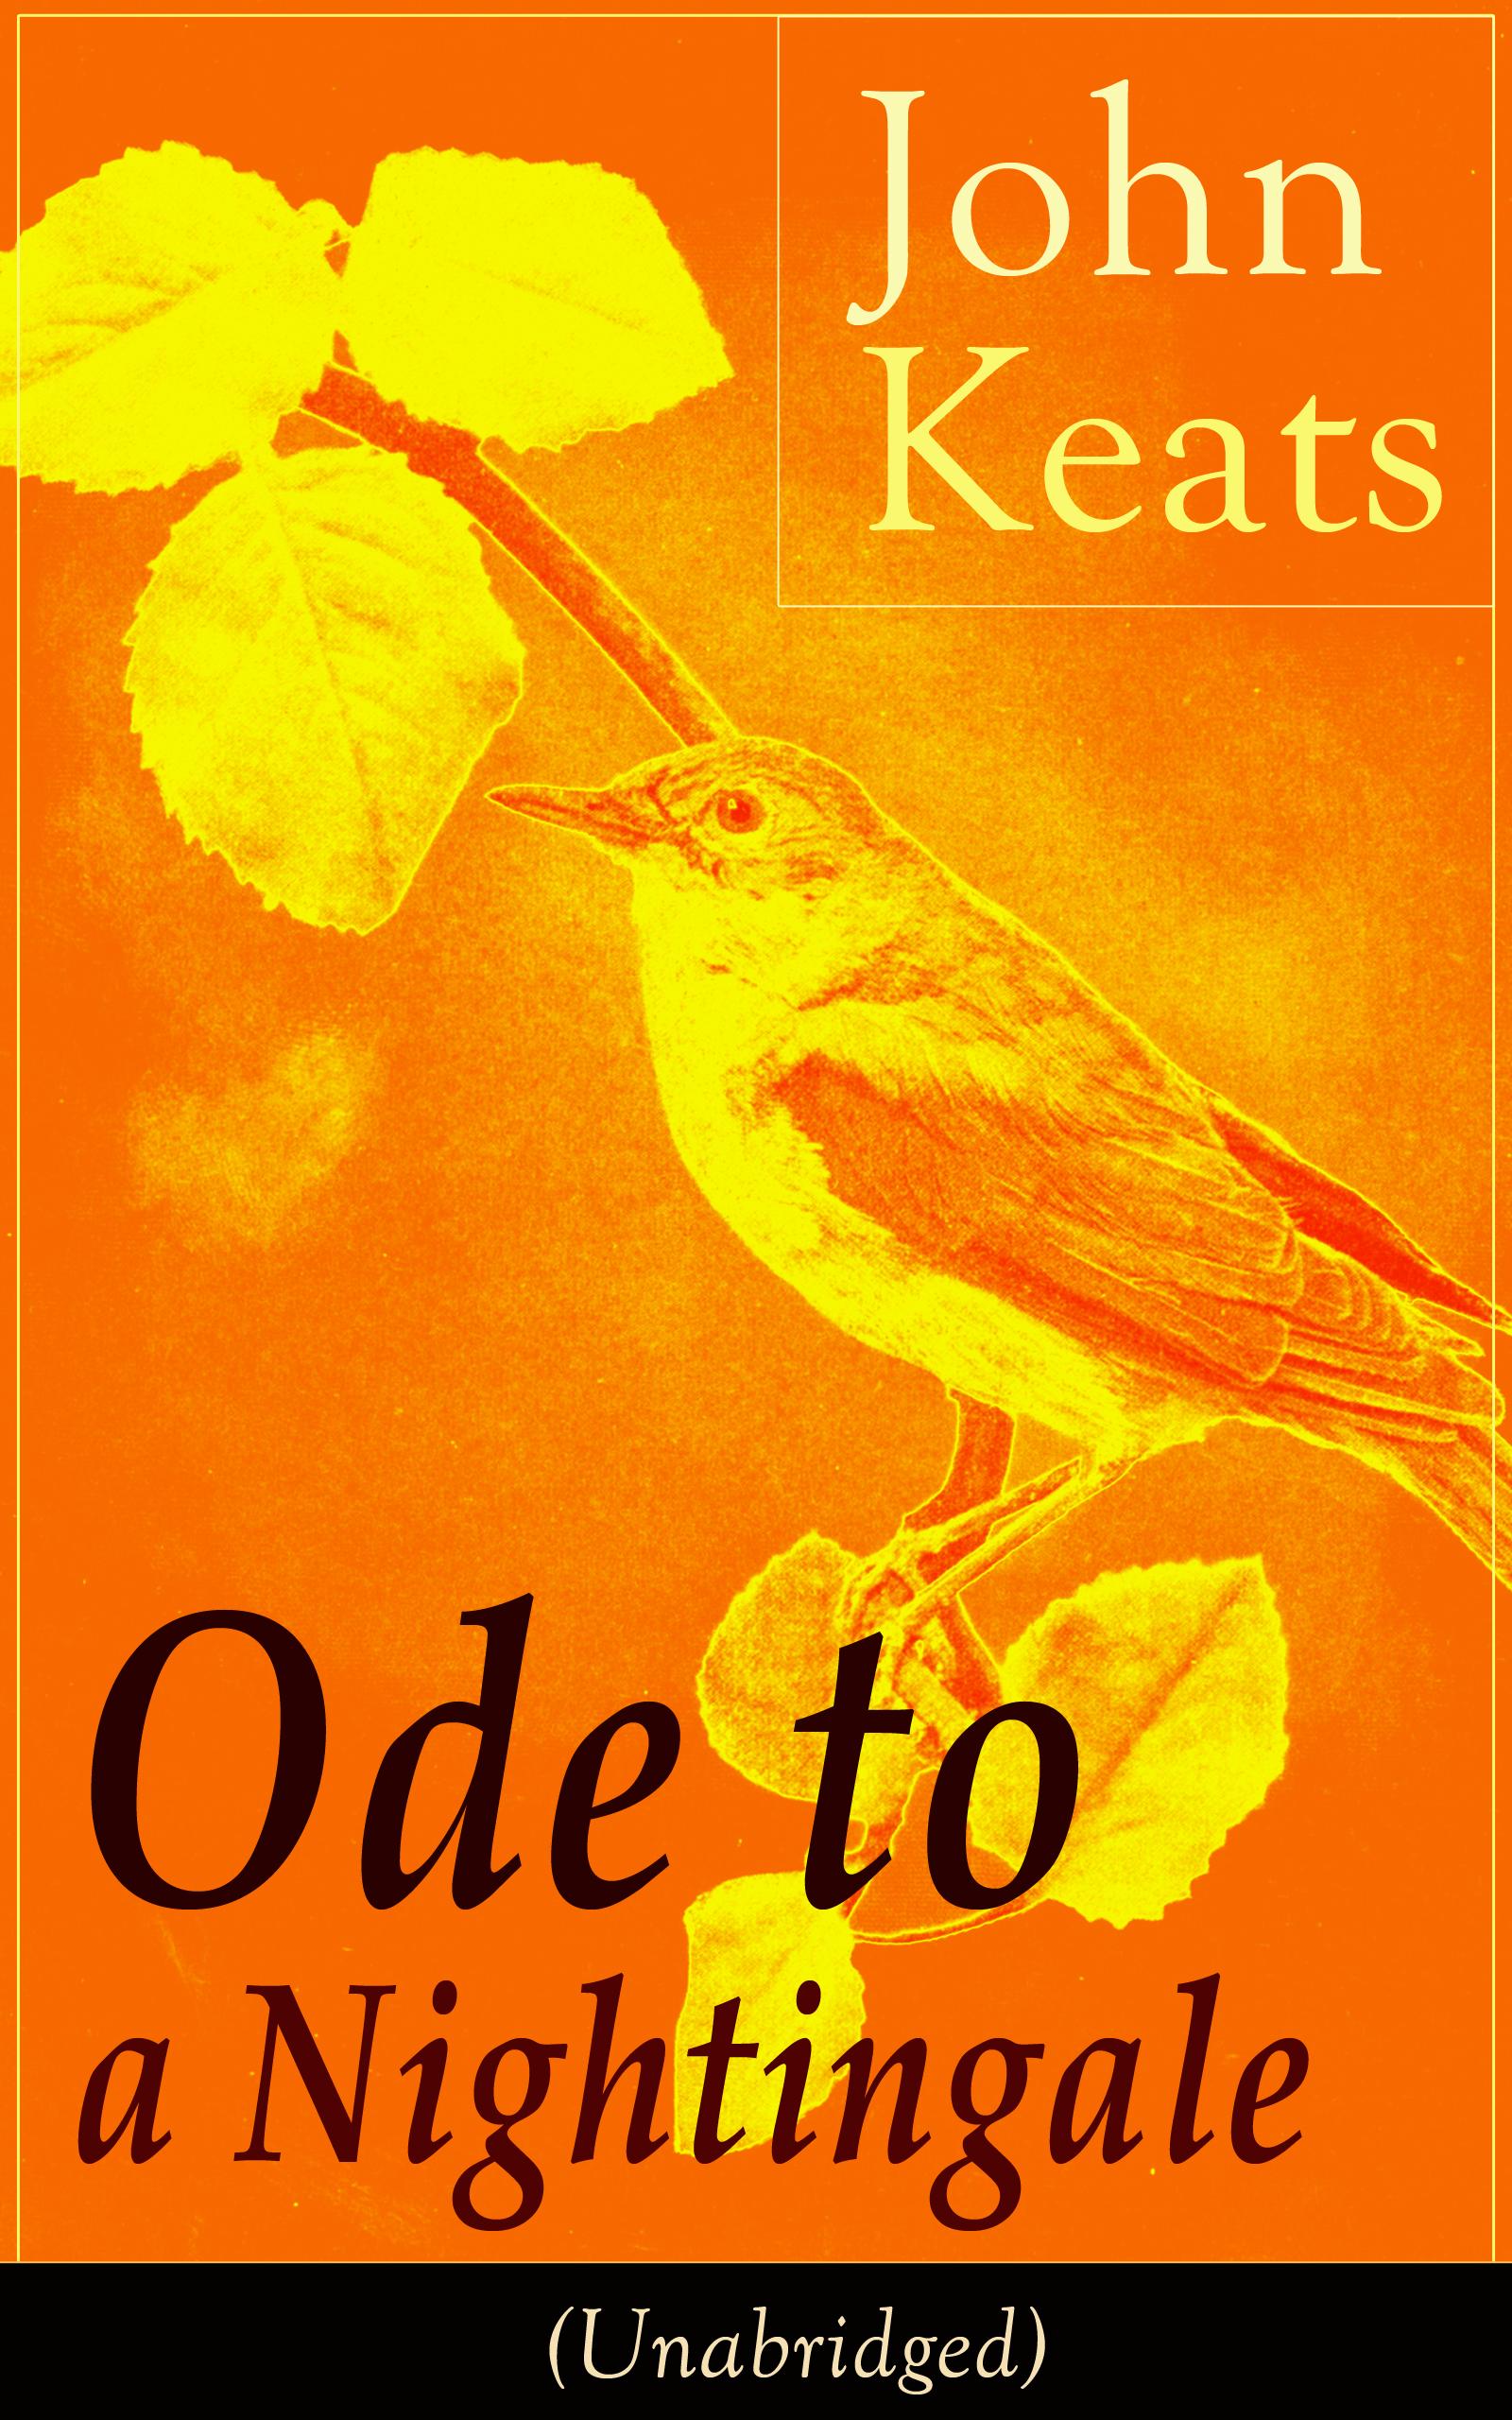 John Keats John Keats: Ode to a Nightingale (Unabridged) john keats the man behind the lyrics life letters and literary remains of john keats